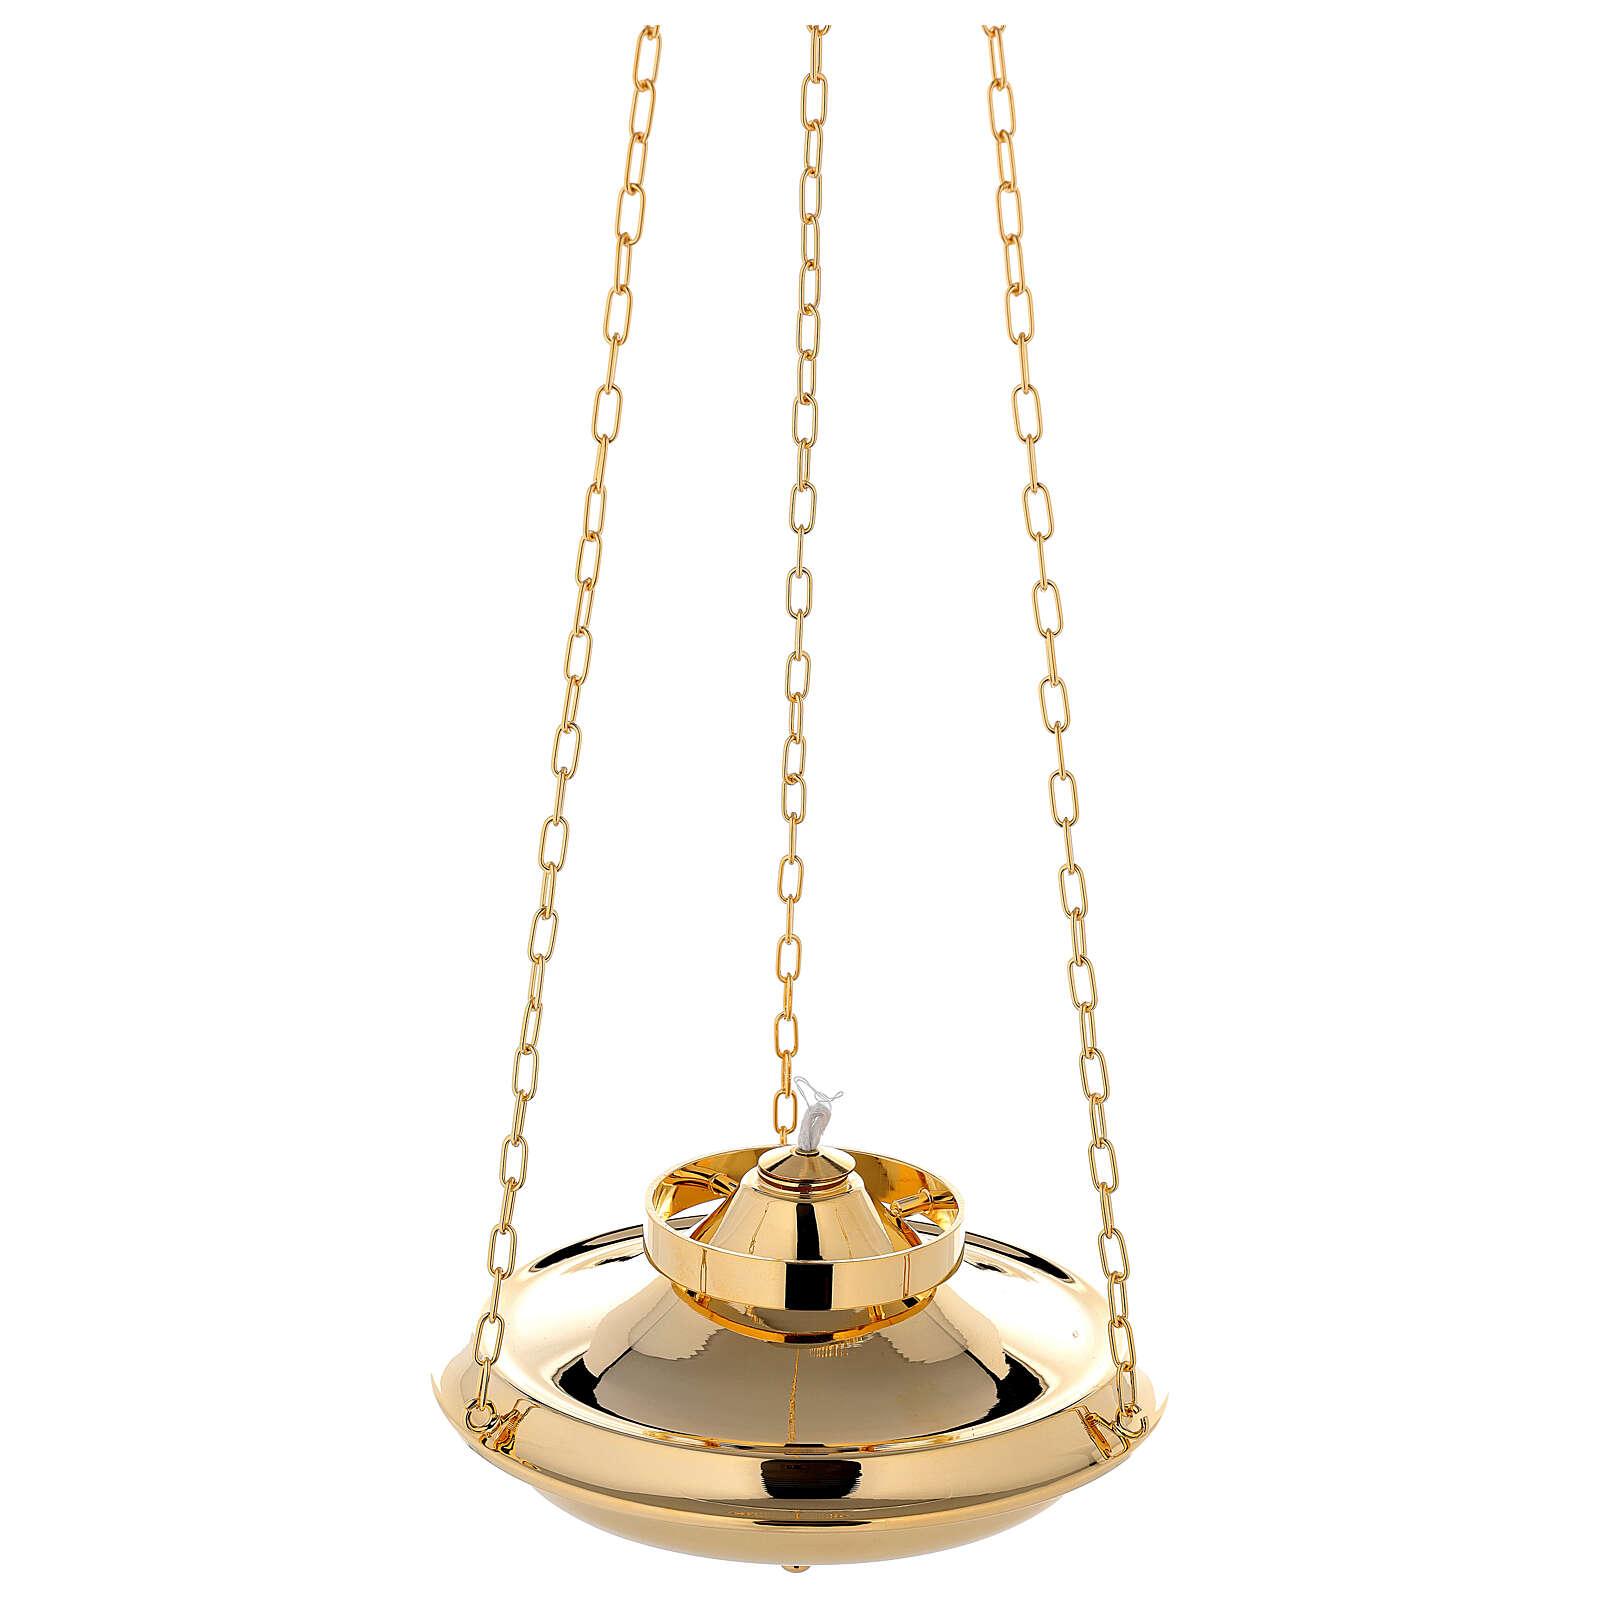 Lampada Santissimo catene 1 m 3